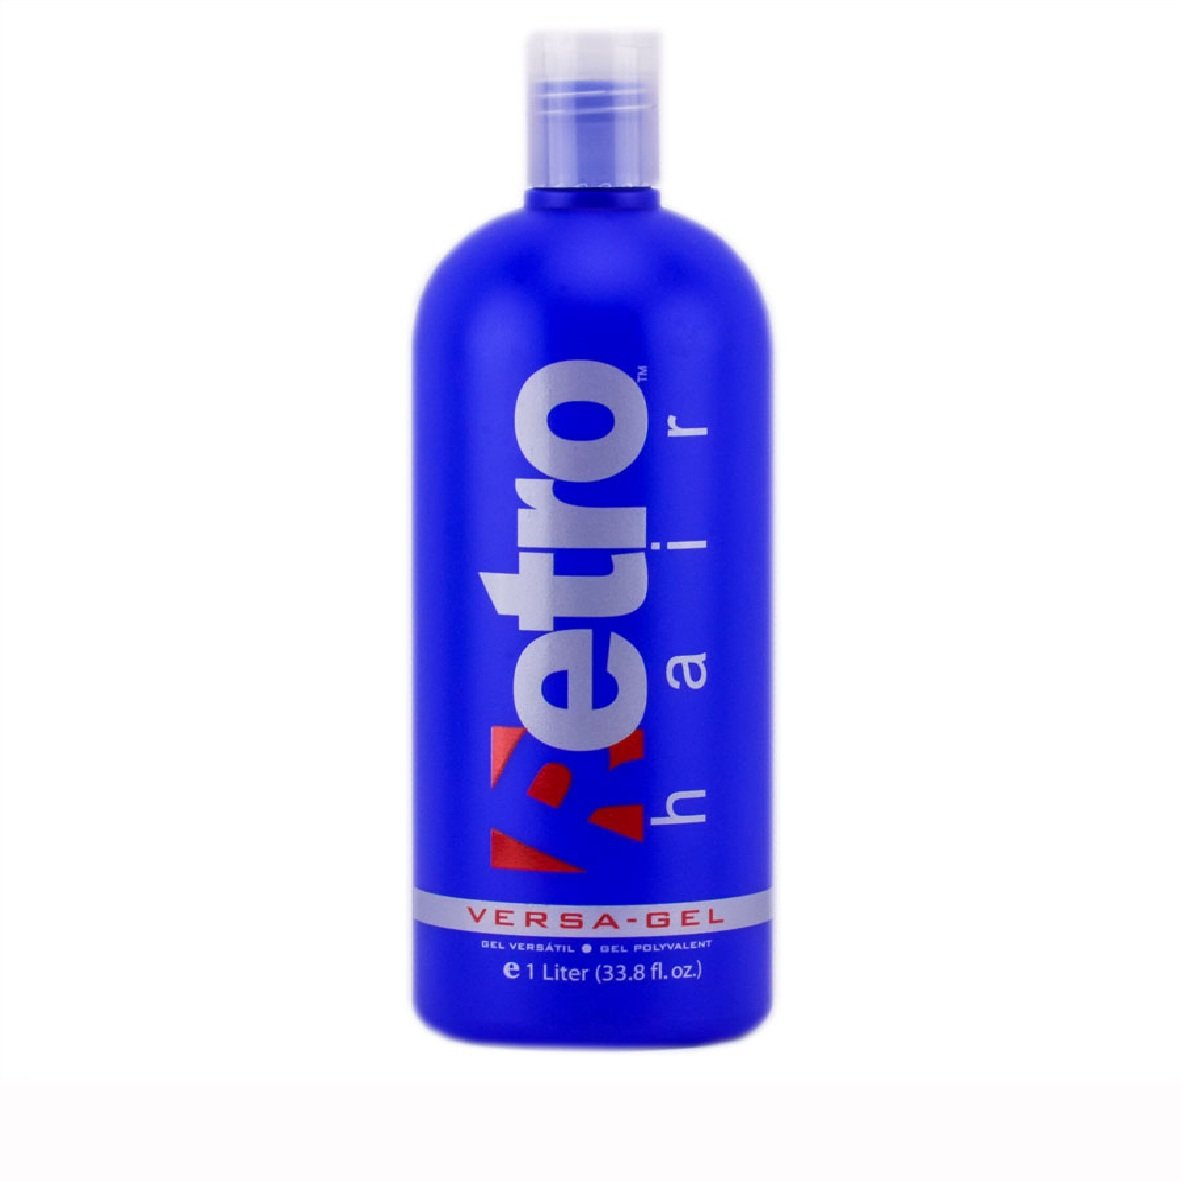 60%OFF Retro Hair Versagel, 33 8 Fluid Ounce - instacc com bo